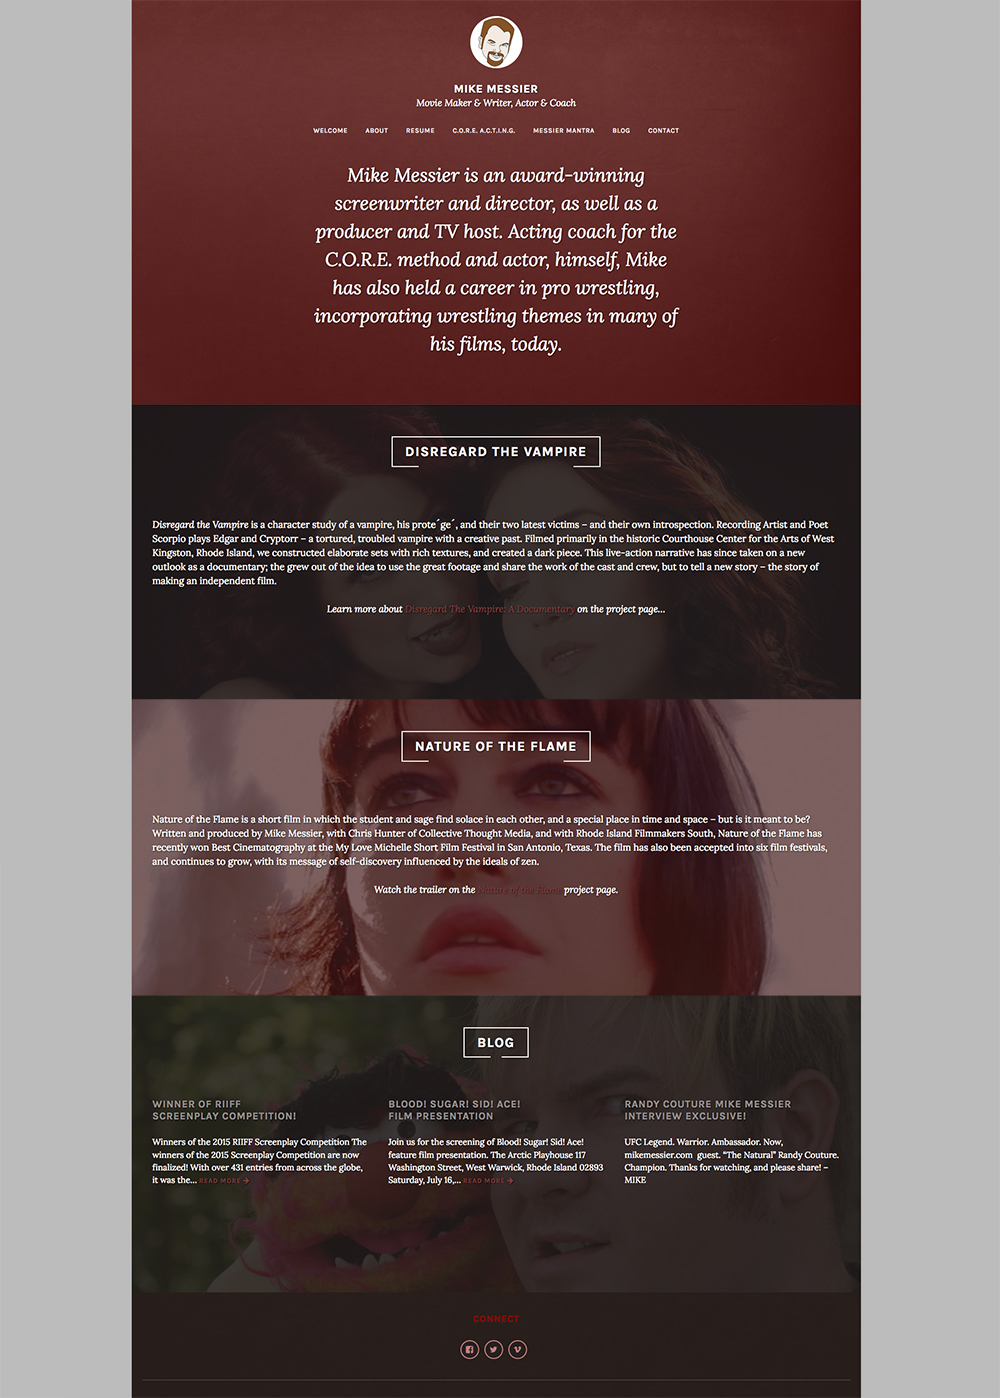 GeenaMatuson_MikeMessier_Website-Home.jpg